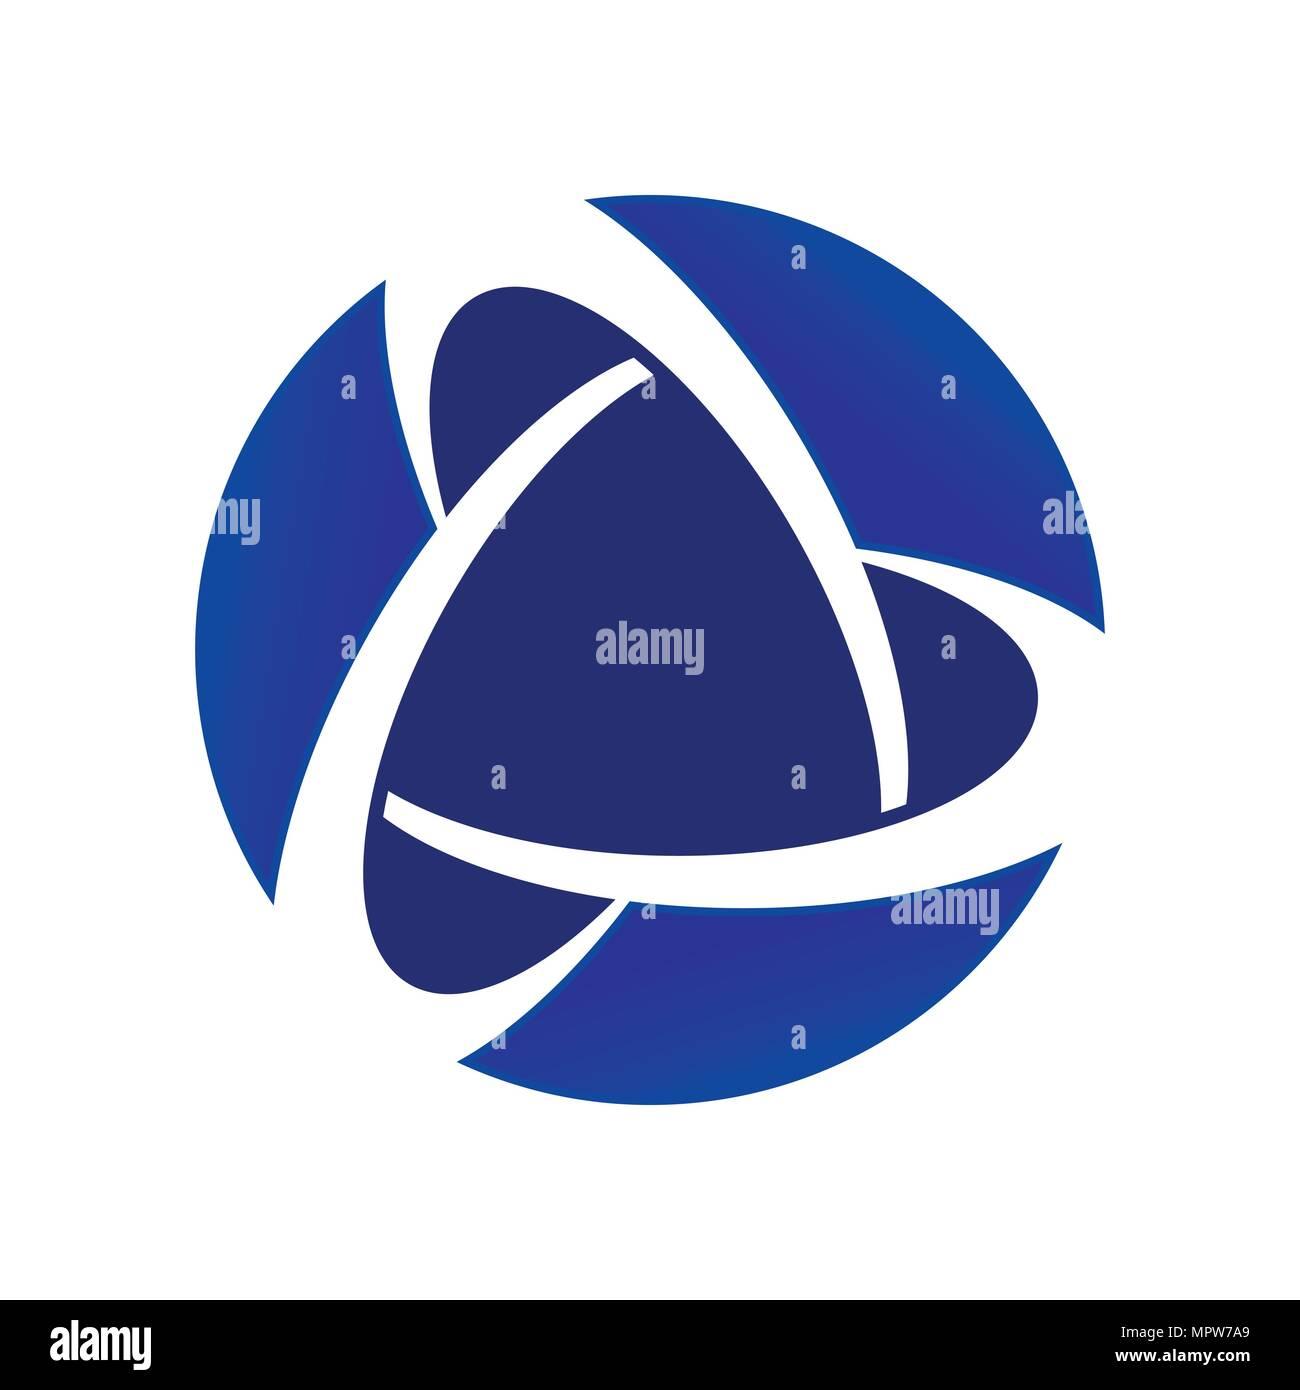 Blue Core Global Alliance Circular Vector Symbol Graphic Logo Design Emblem - Stock Vector